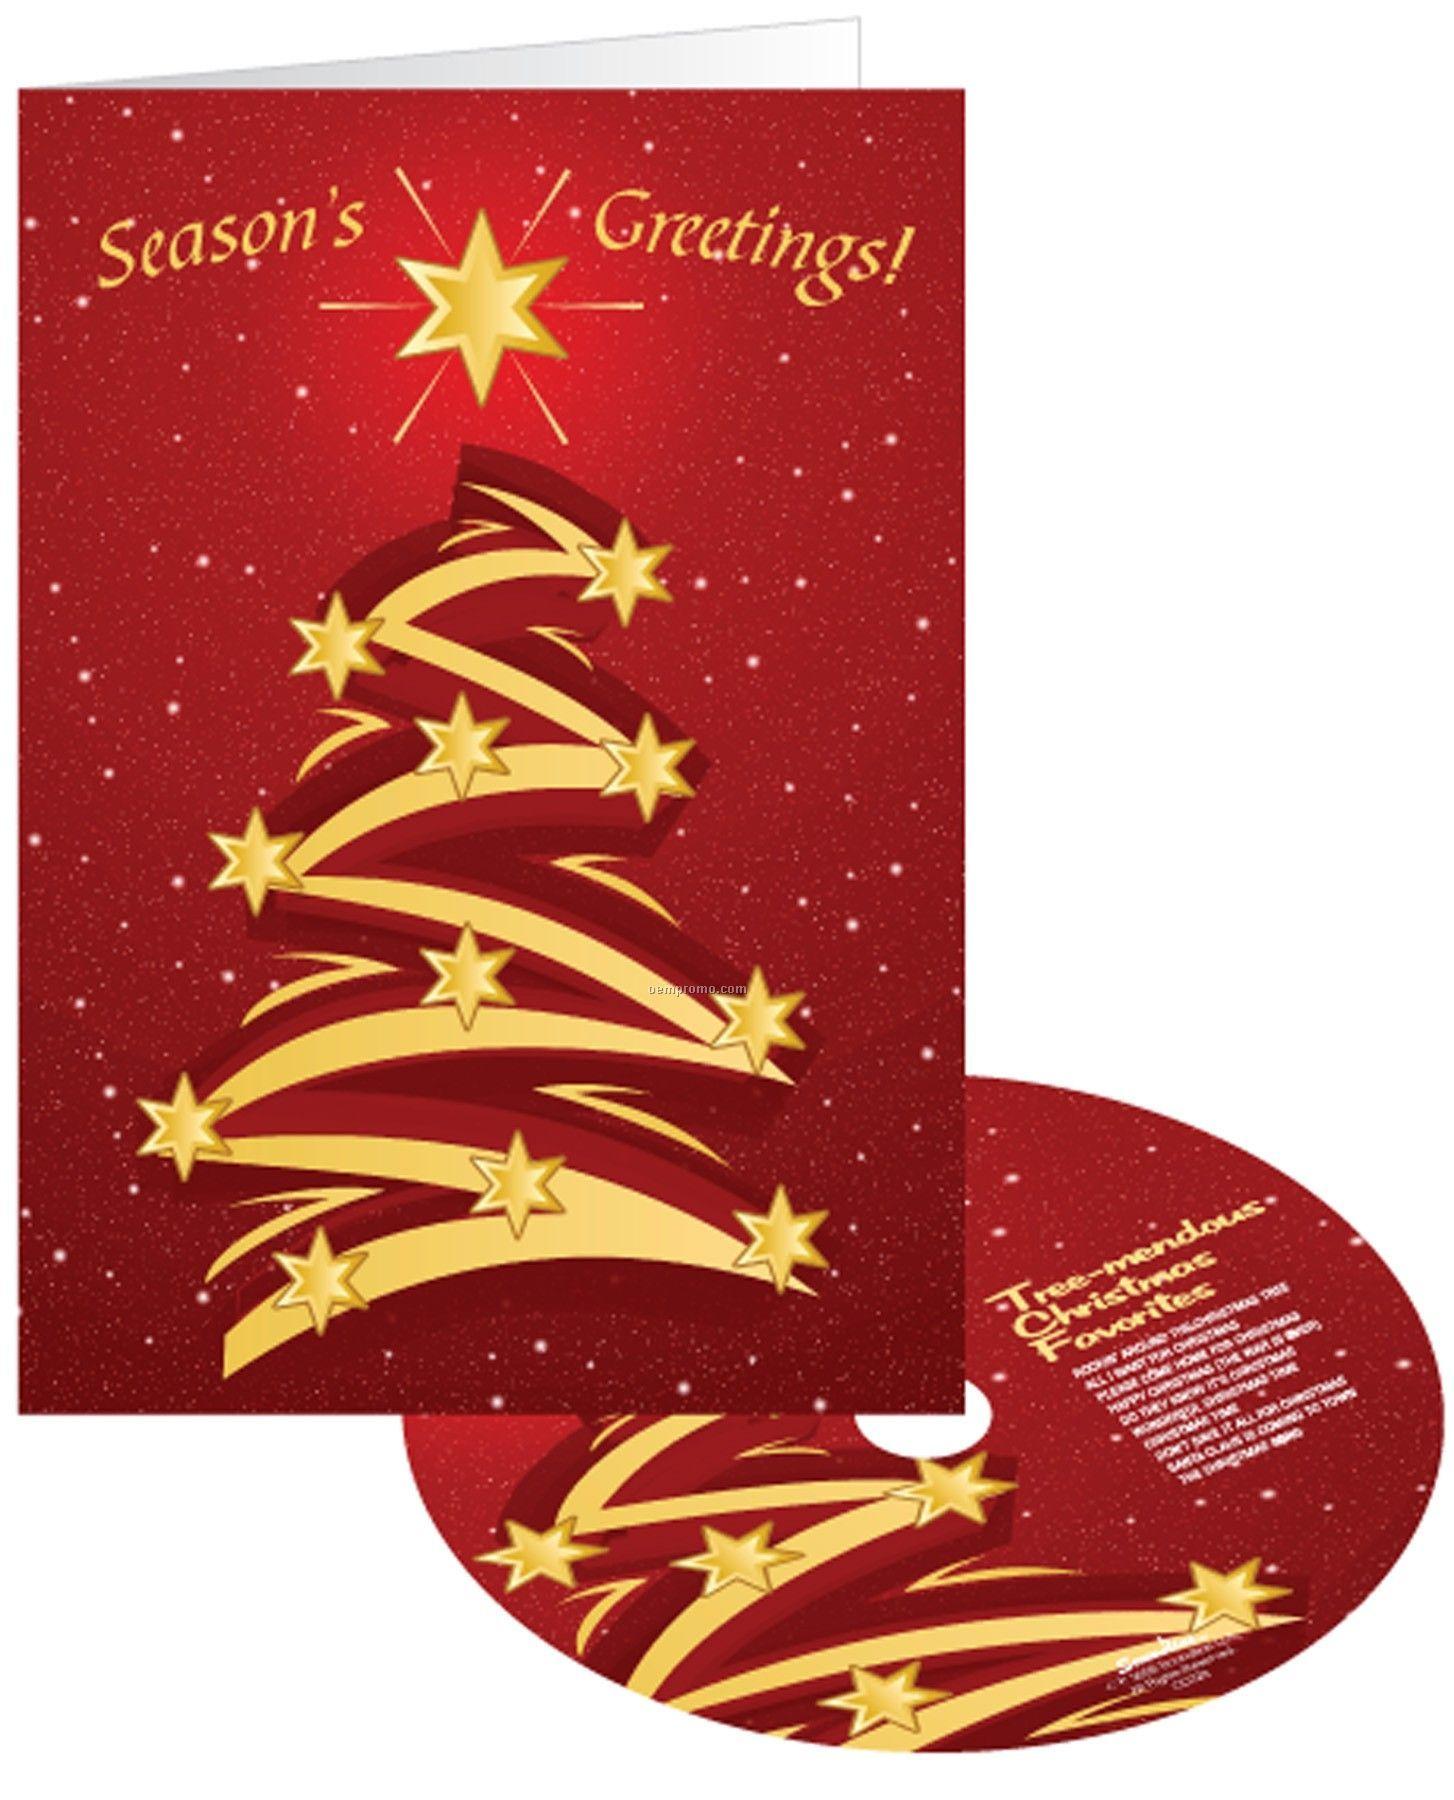 Creative Christmas Tree Holiday Greeting Card With Matching Cdchina